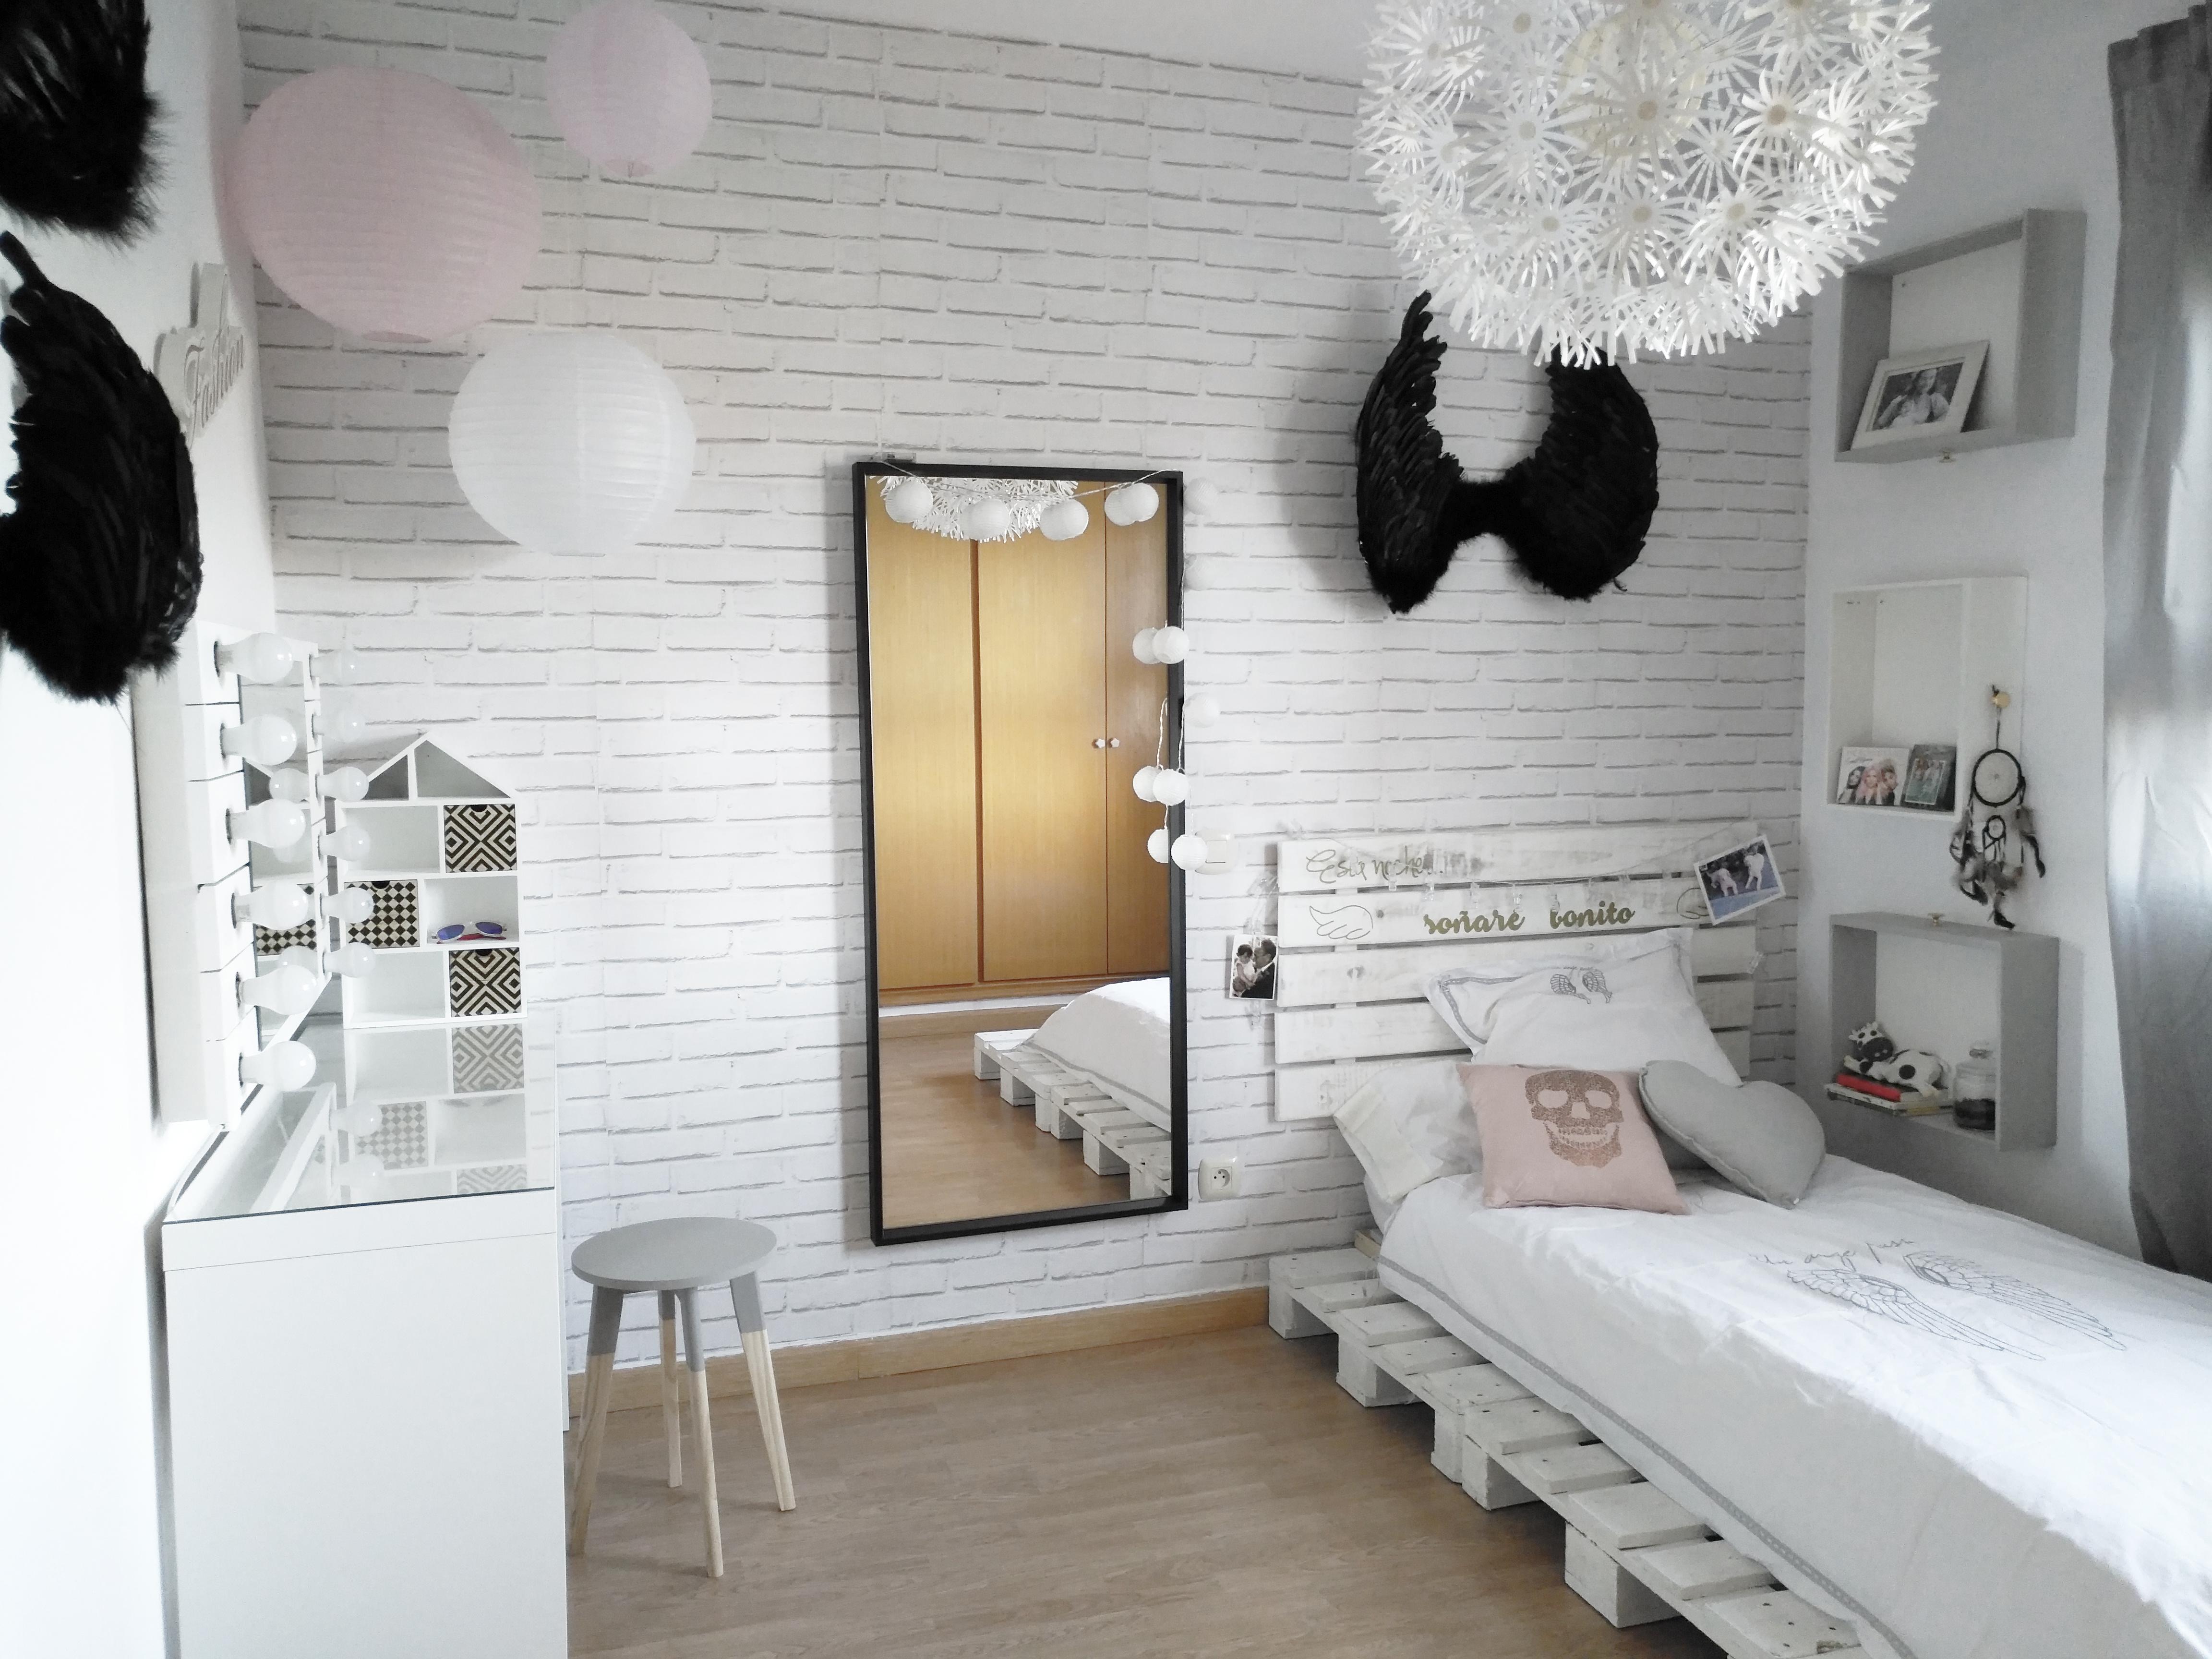 camas de 120 ikea interesting lit minnen ikea ikea kritter toddler bed frame nazarm with camas. Black Bedroom Furniture Sets. Home Design Ideas